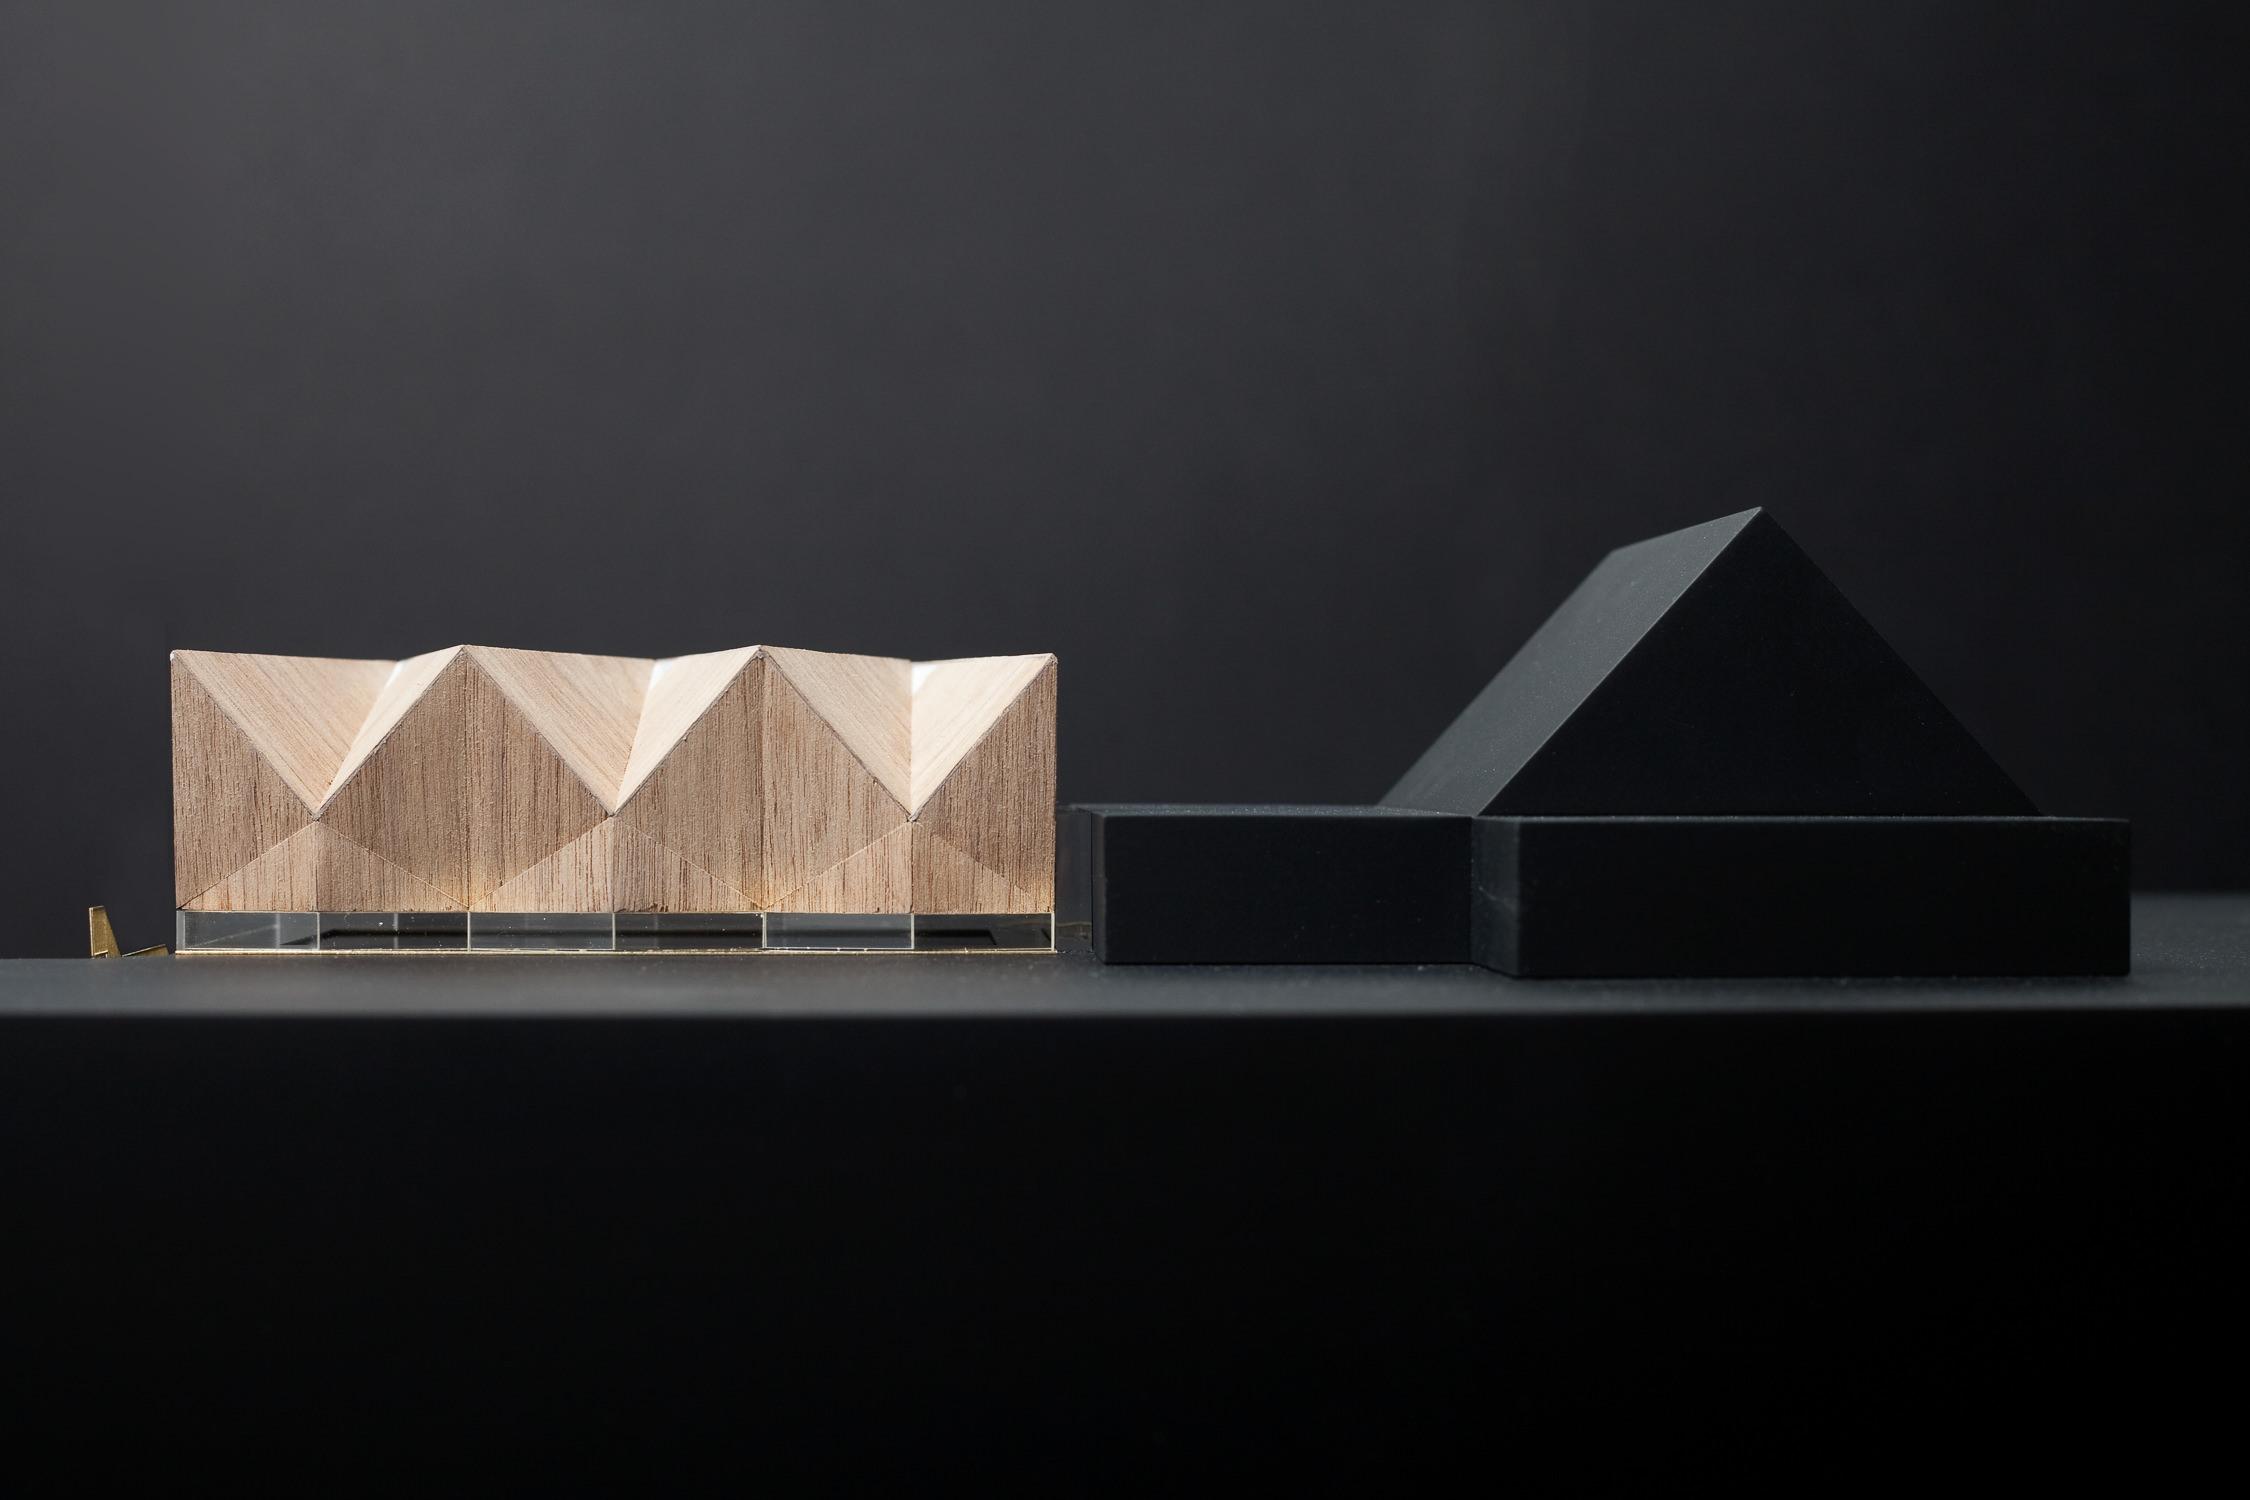 mark-hadden-architecture-photographer-architectuur-interieur-fotografie-london-dma-alfriston-model026-.jpg